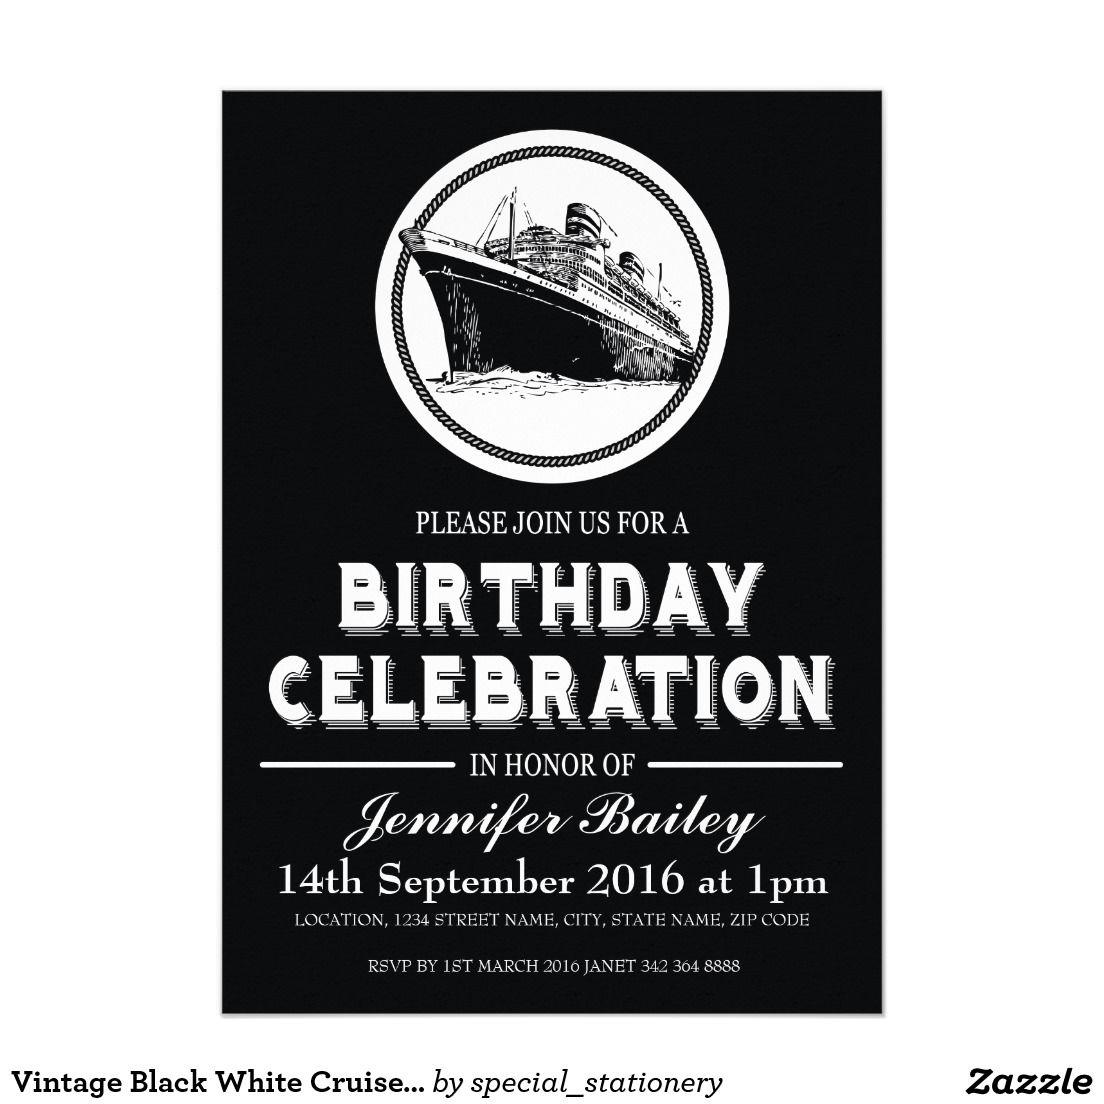 Vintage black white cruise ship birthday invitation card vintage black white cruise ship birthday invitation card vintagebirthdayinvites cruisebirthday blacktiebirthday filmwisefo Image collections